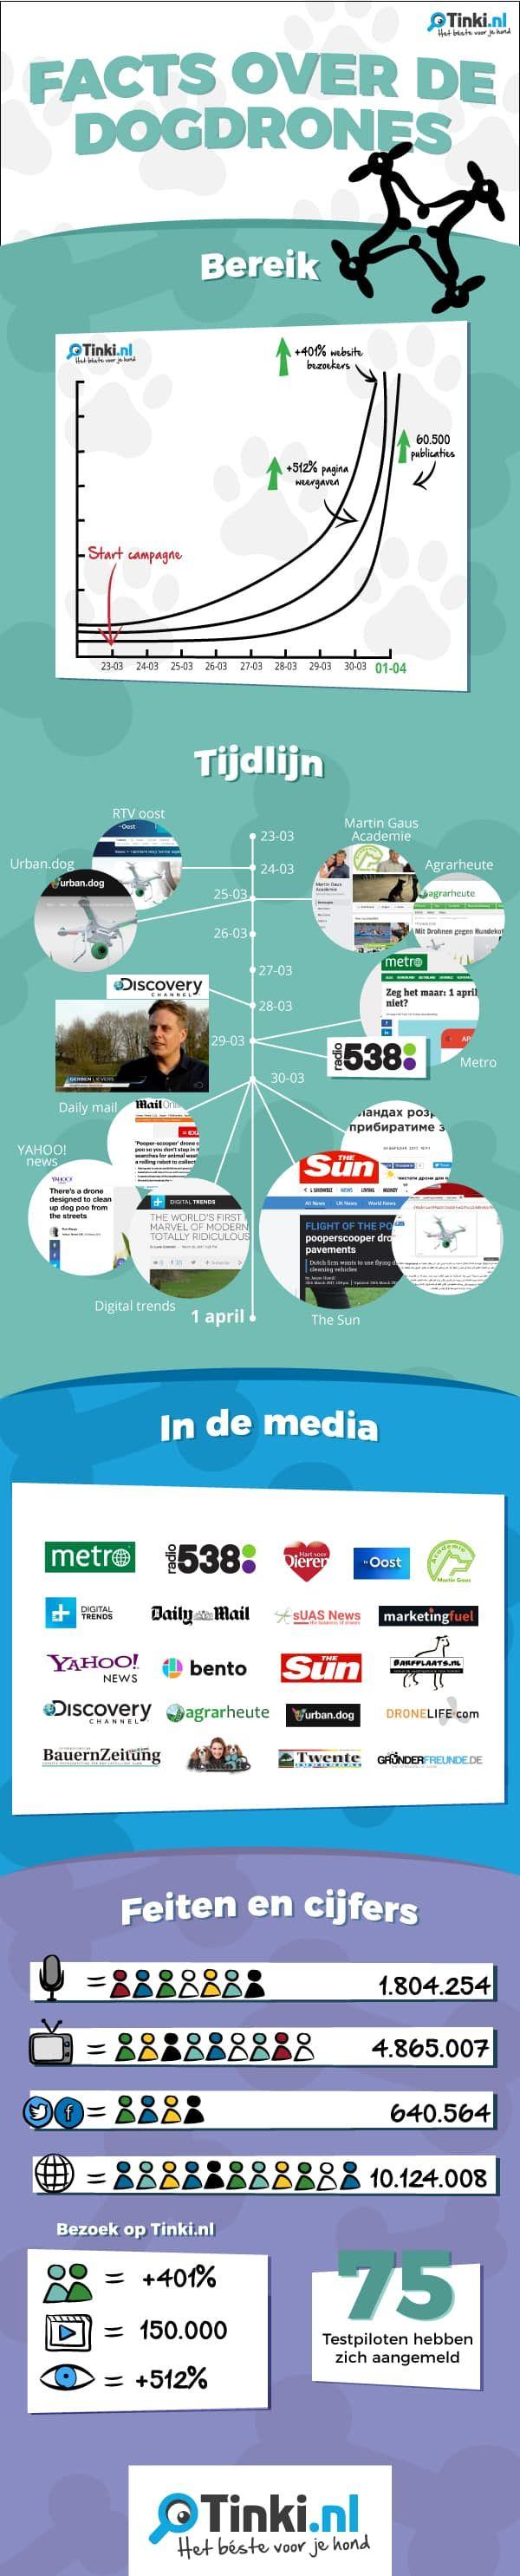 infographic dogdrones